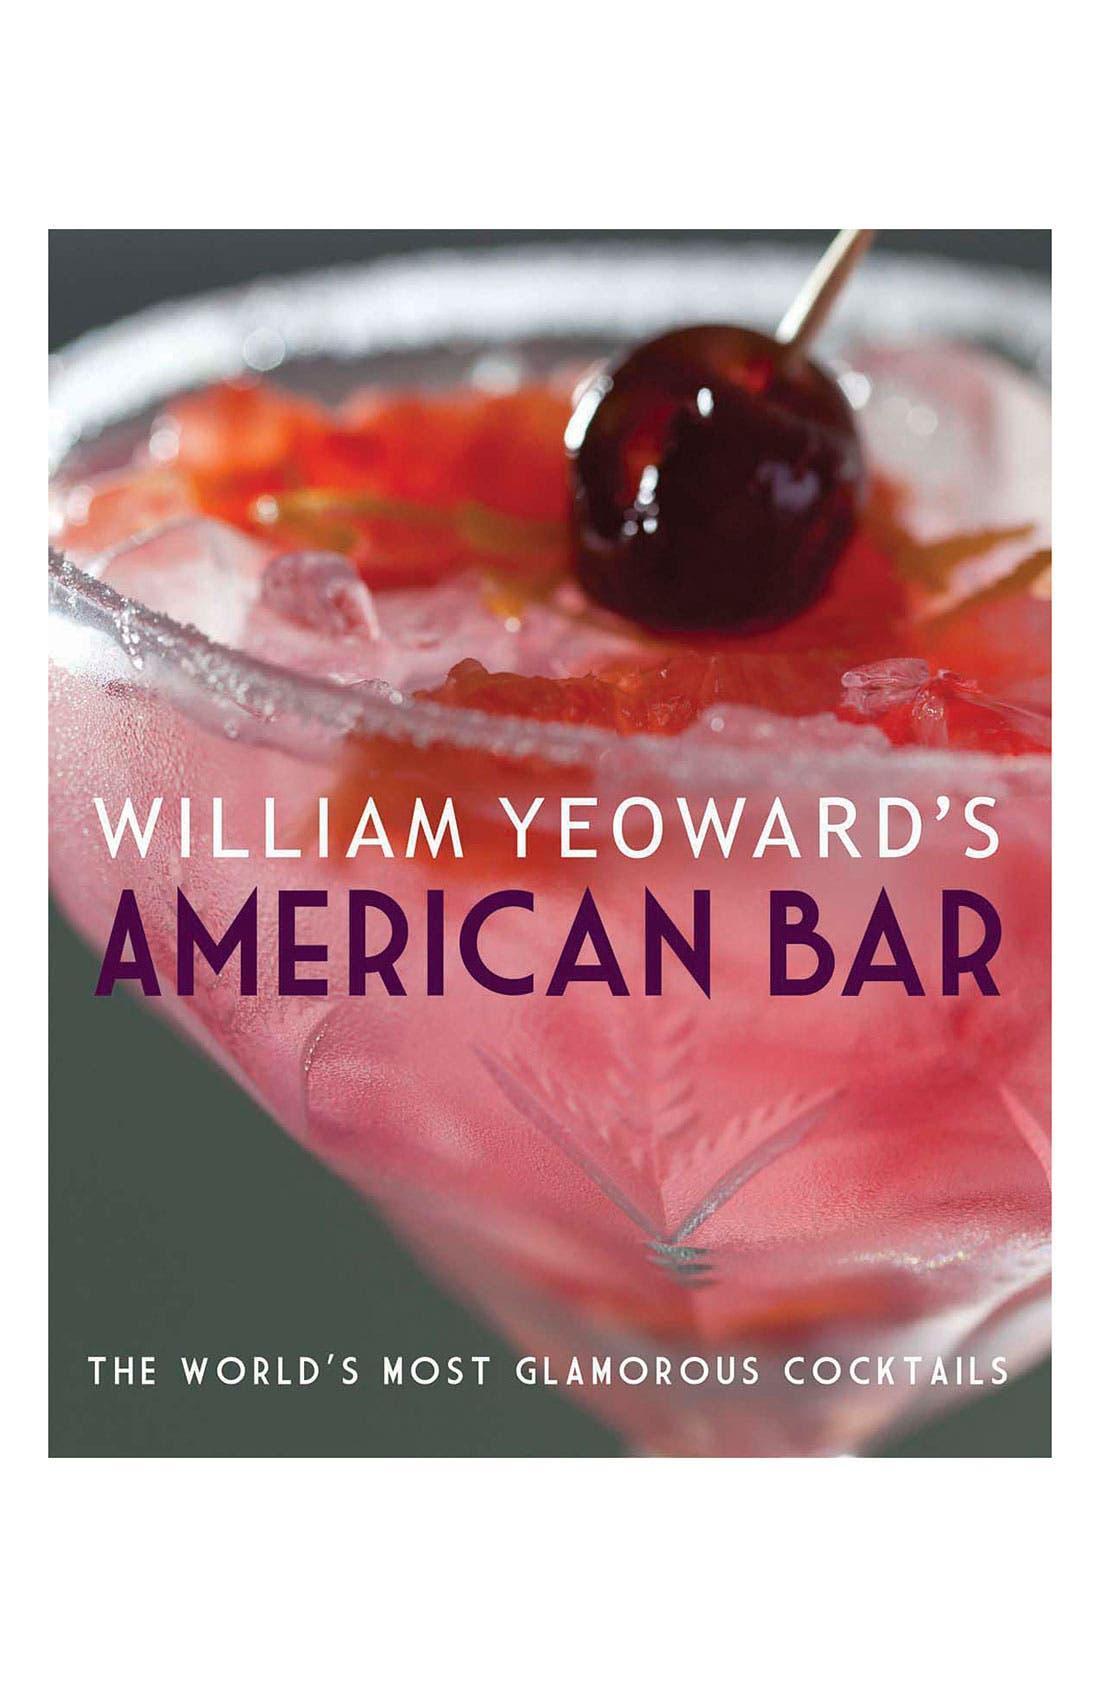 Alternate Image 1 Selected - 'William Yeoward's American Bar' Drink Book